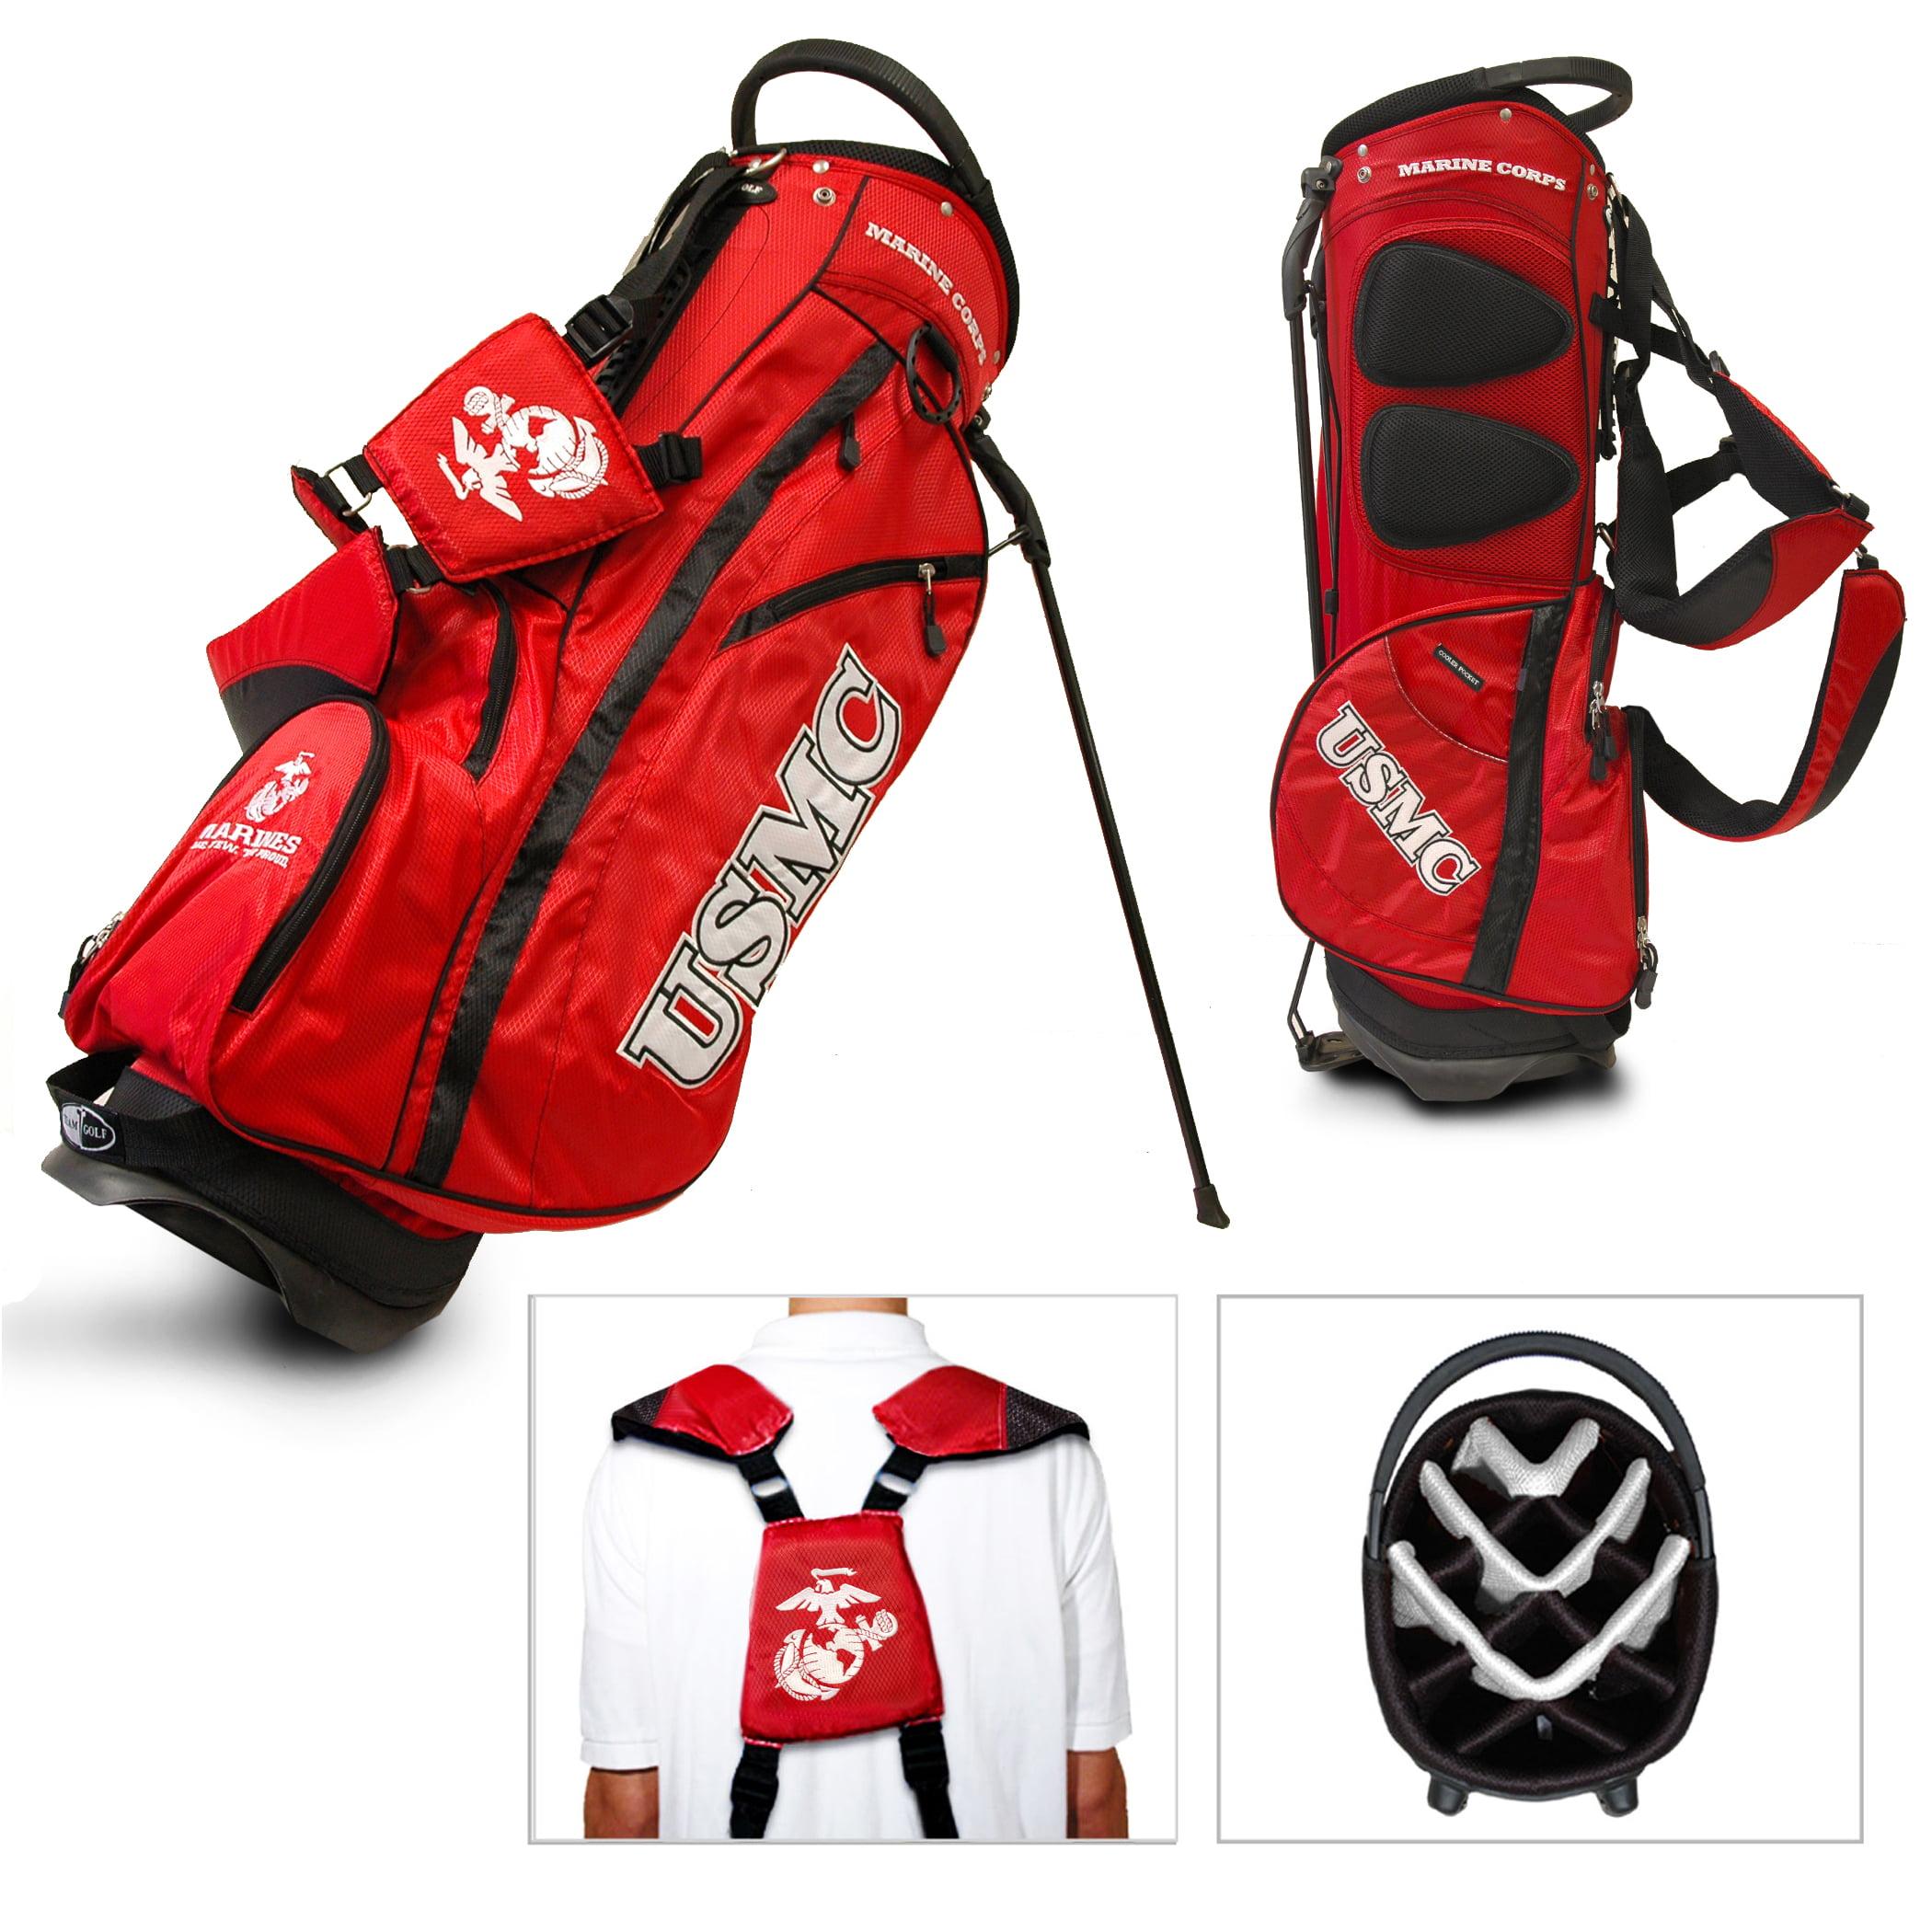 Team Golf Military Us Marines Fairway Golf Stand Bag